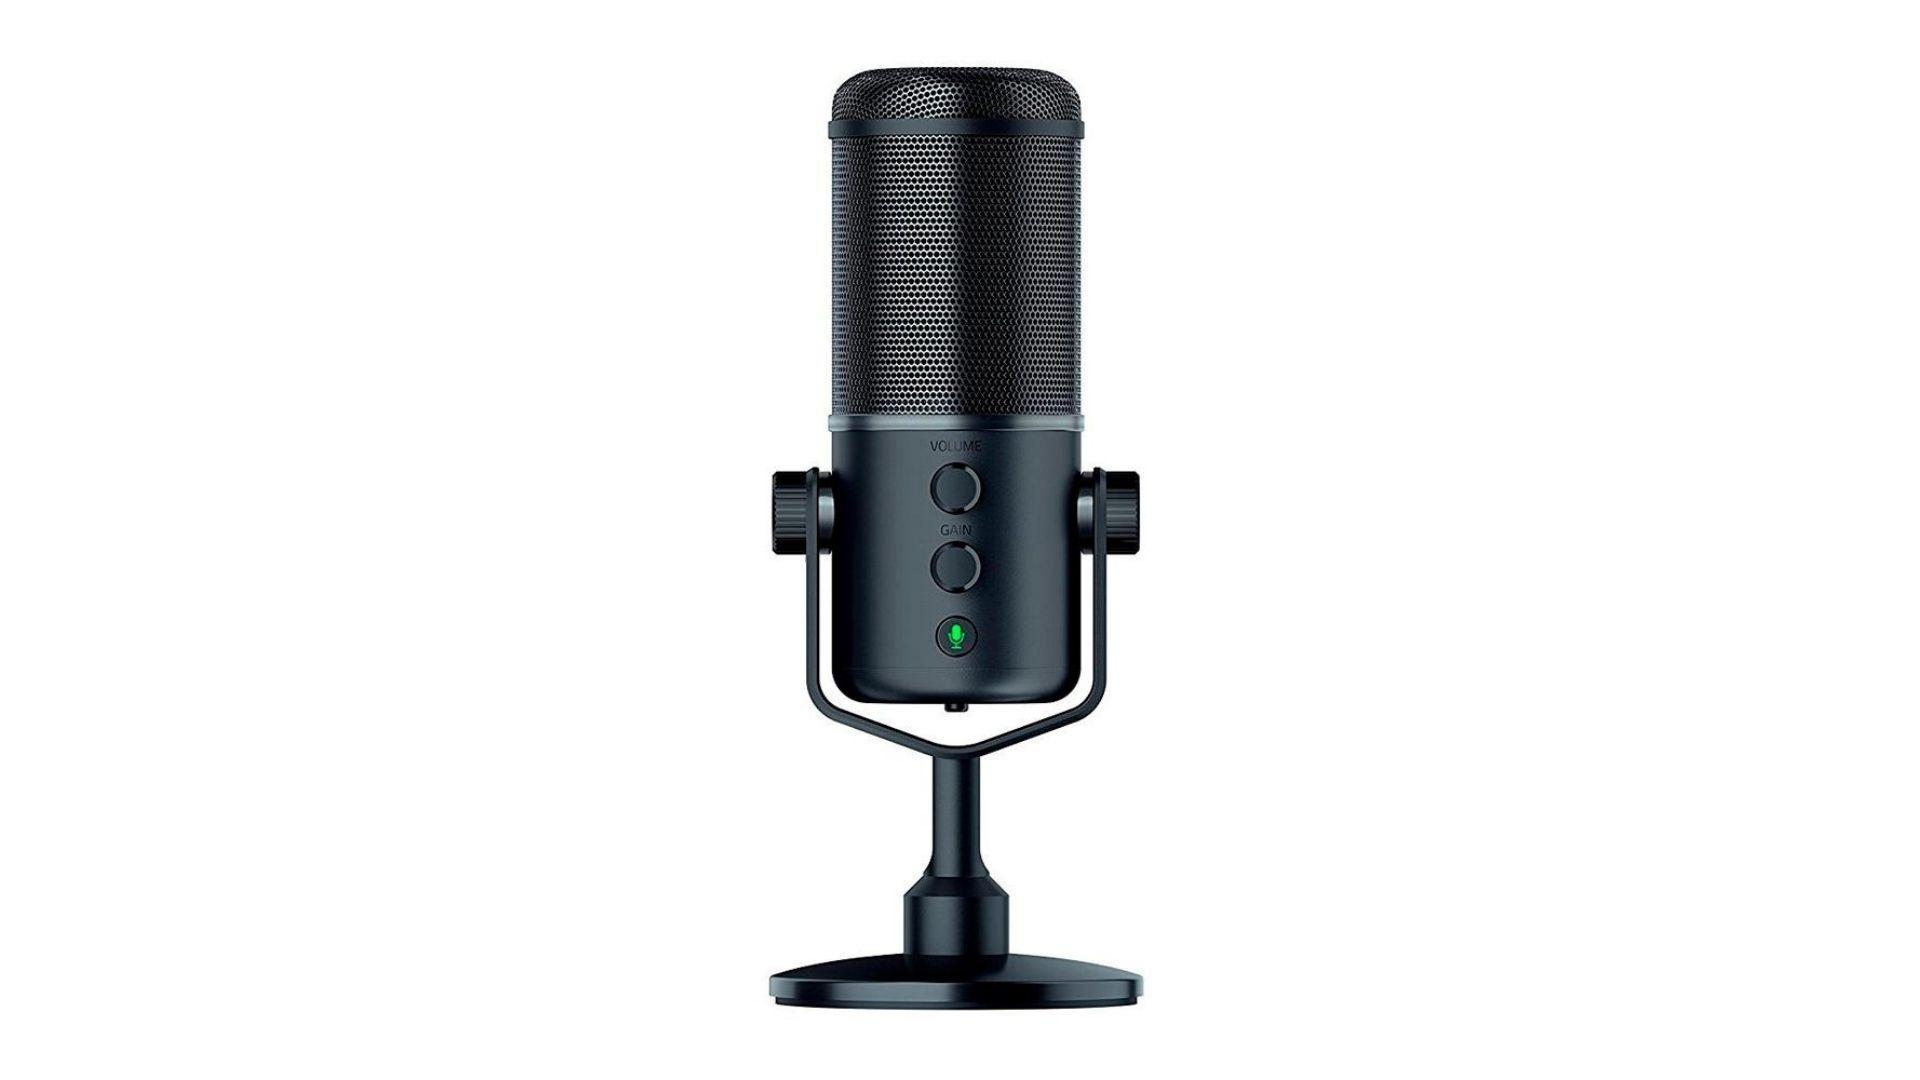 Microfone Razer Seiren Elite preto